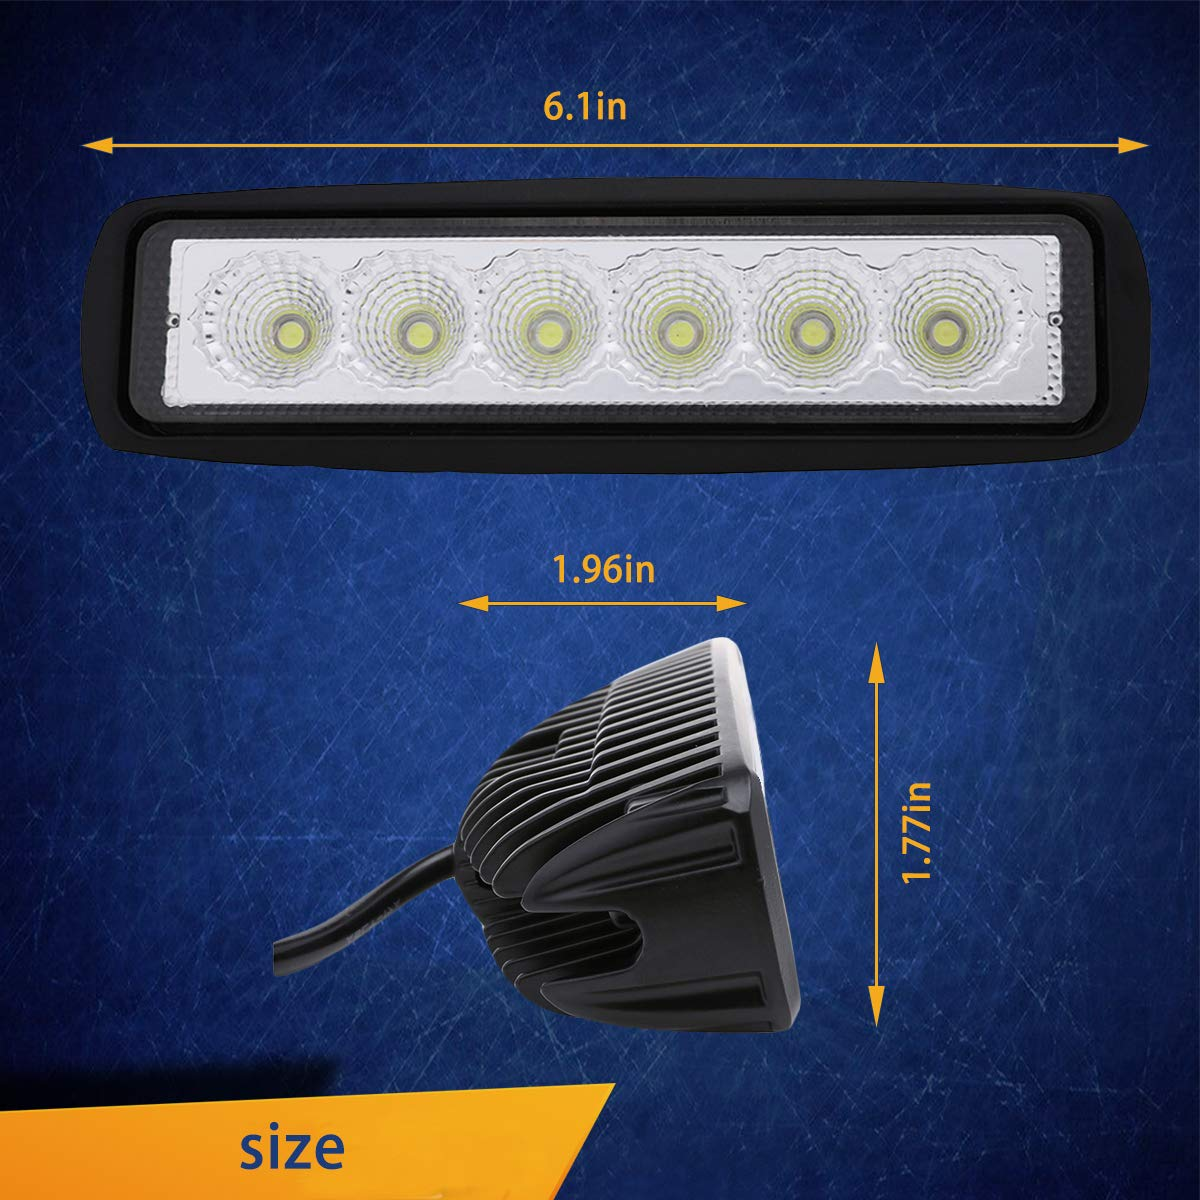 WGL LED Light Bar 2Pcs 18W Flood LED Work Light High Power Epistar LEDs Single Row Vehicle Off-Road Led Lights Driving Light Fog Light for Car Jeep SUV ATV 4WD